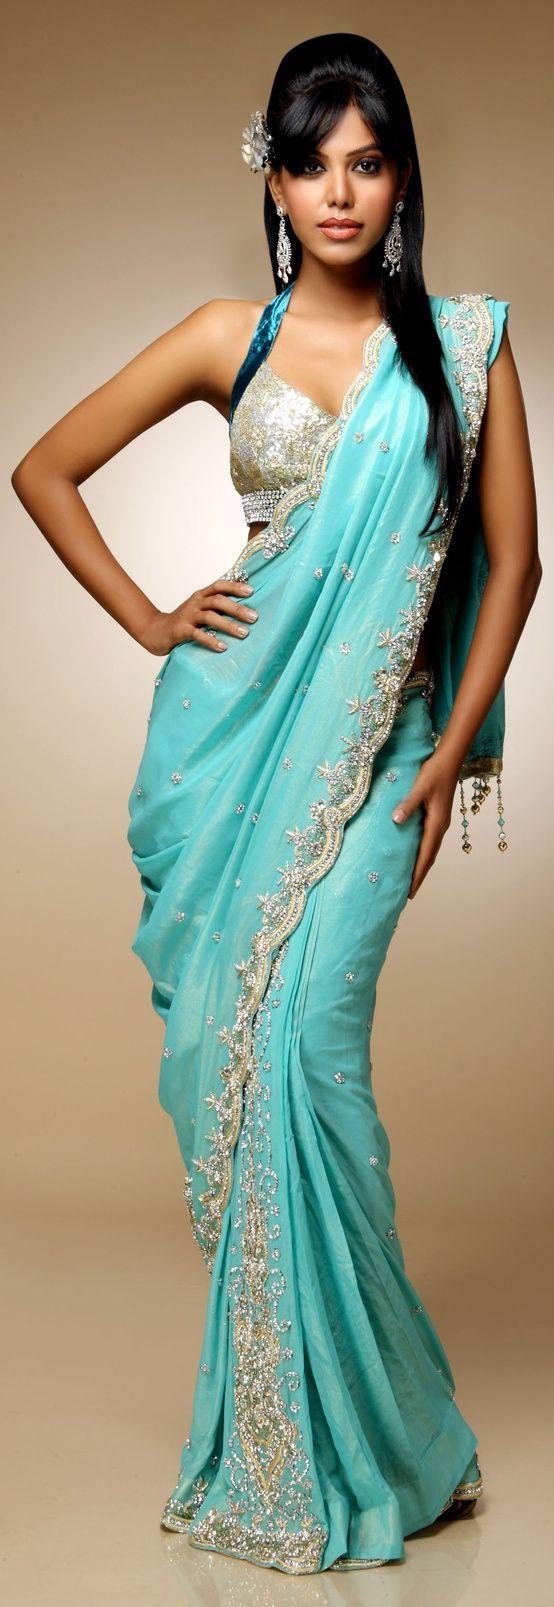 Saree blouse Bollywood Fashion - | indian oufits | Pinterest